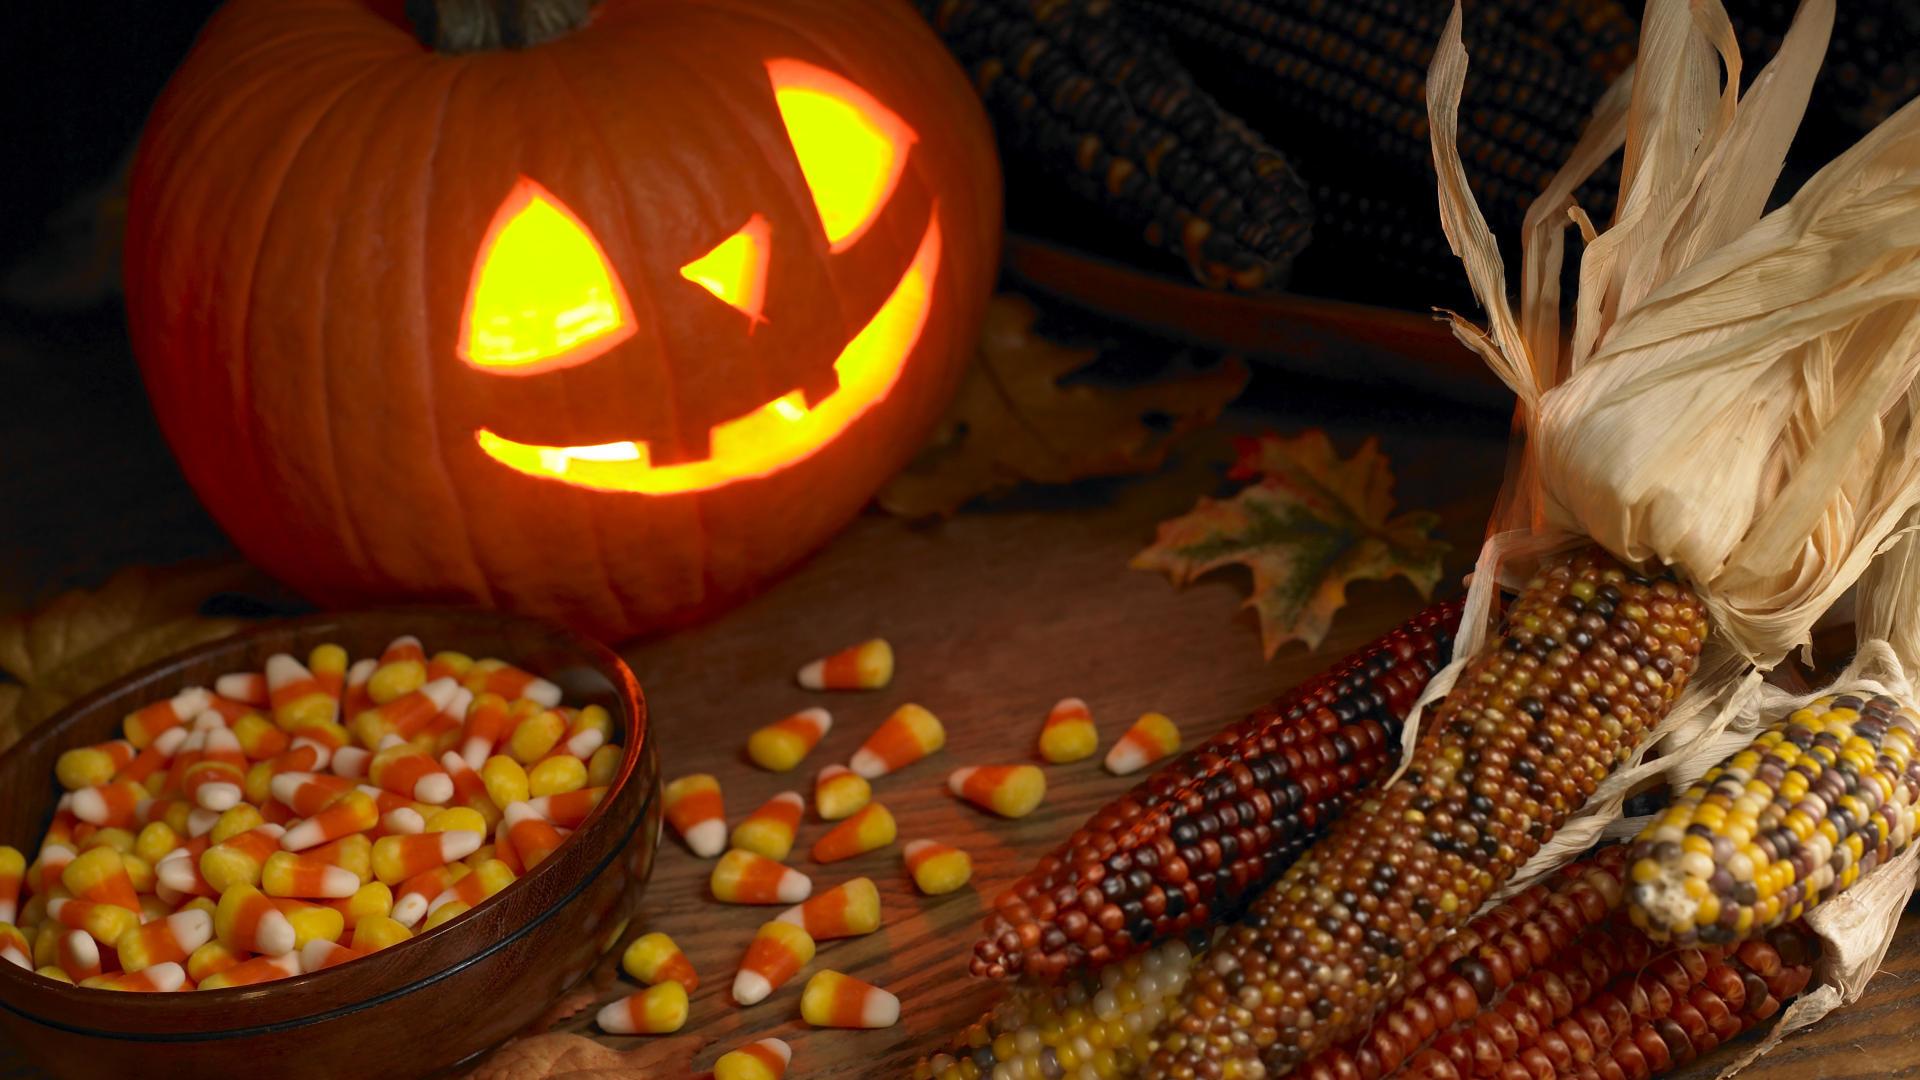 Free Halloween Wallpaper – HD Wallpapers Backgrounds of Your Choice. Free  Halloween Wallpaper HD Wallpapers Backgrounds Of Your Choice